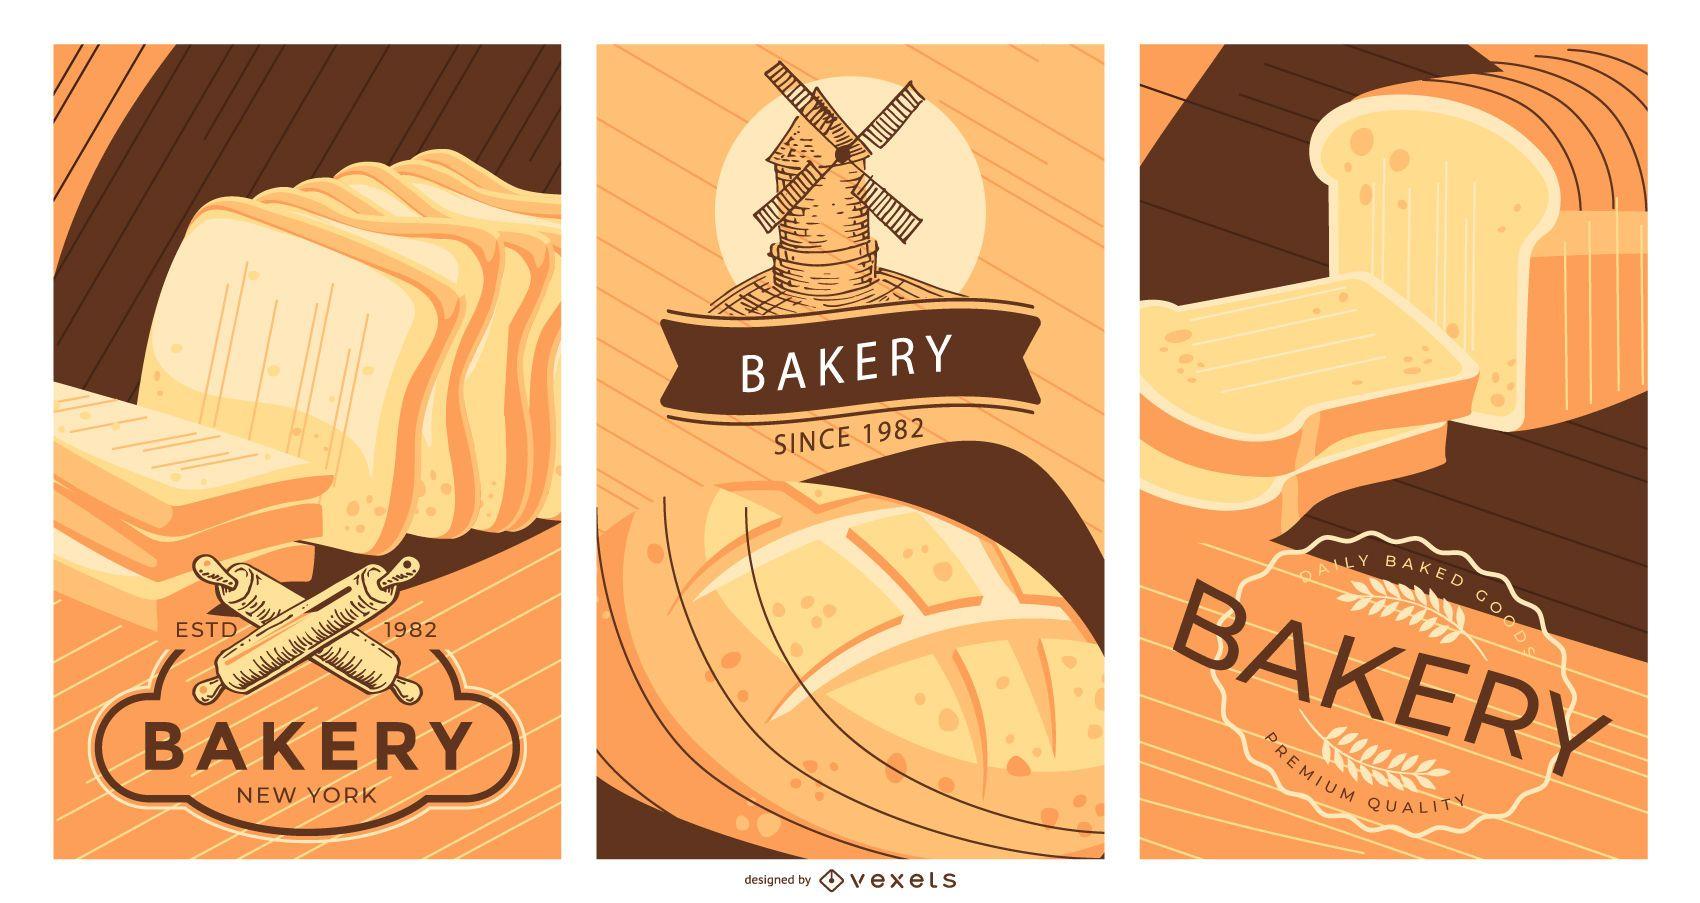 Bakery Editable Poster Design Set